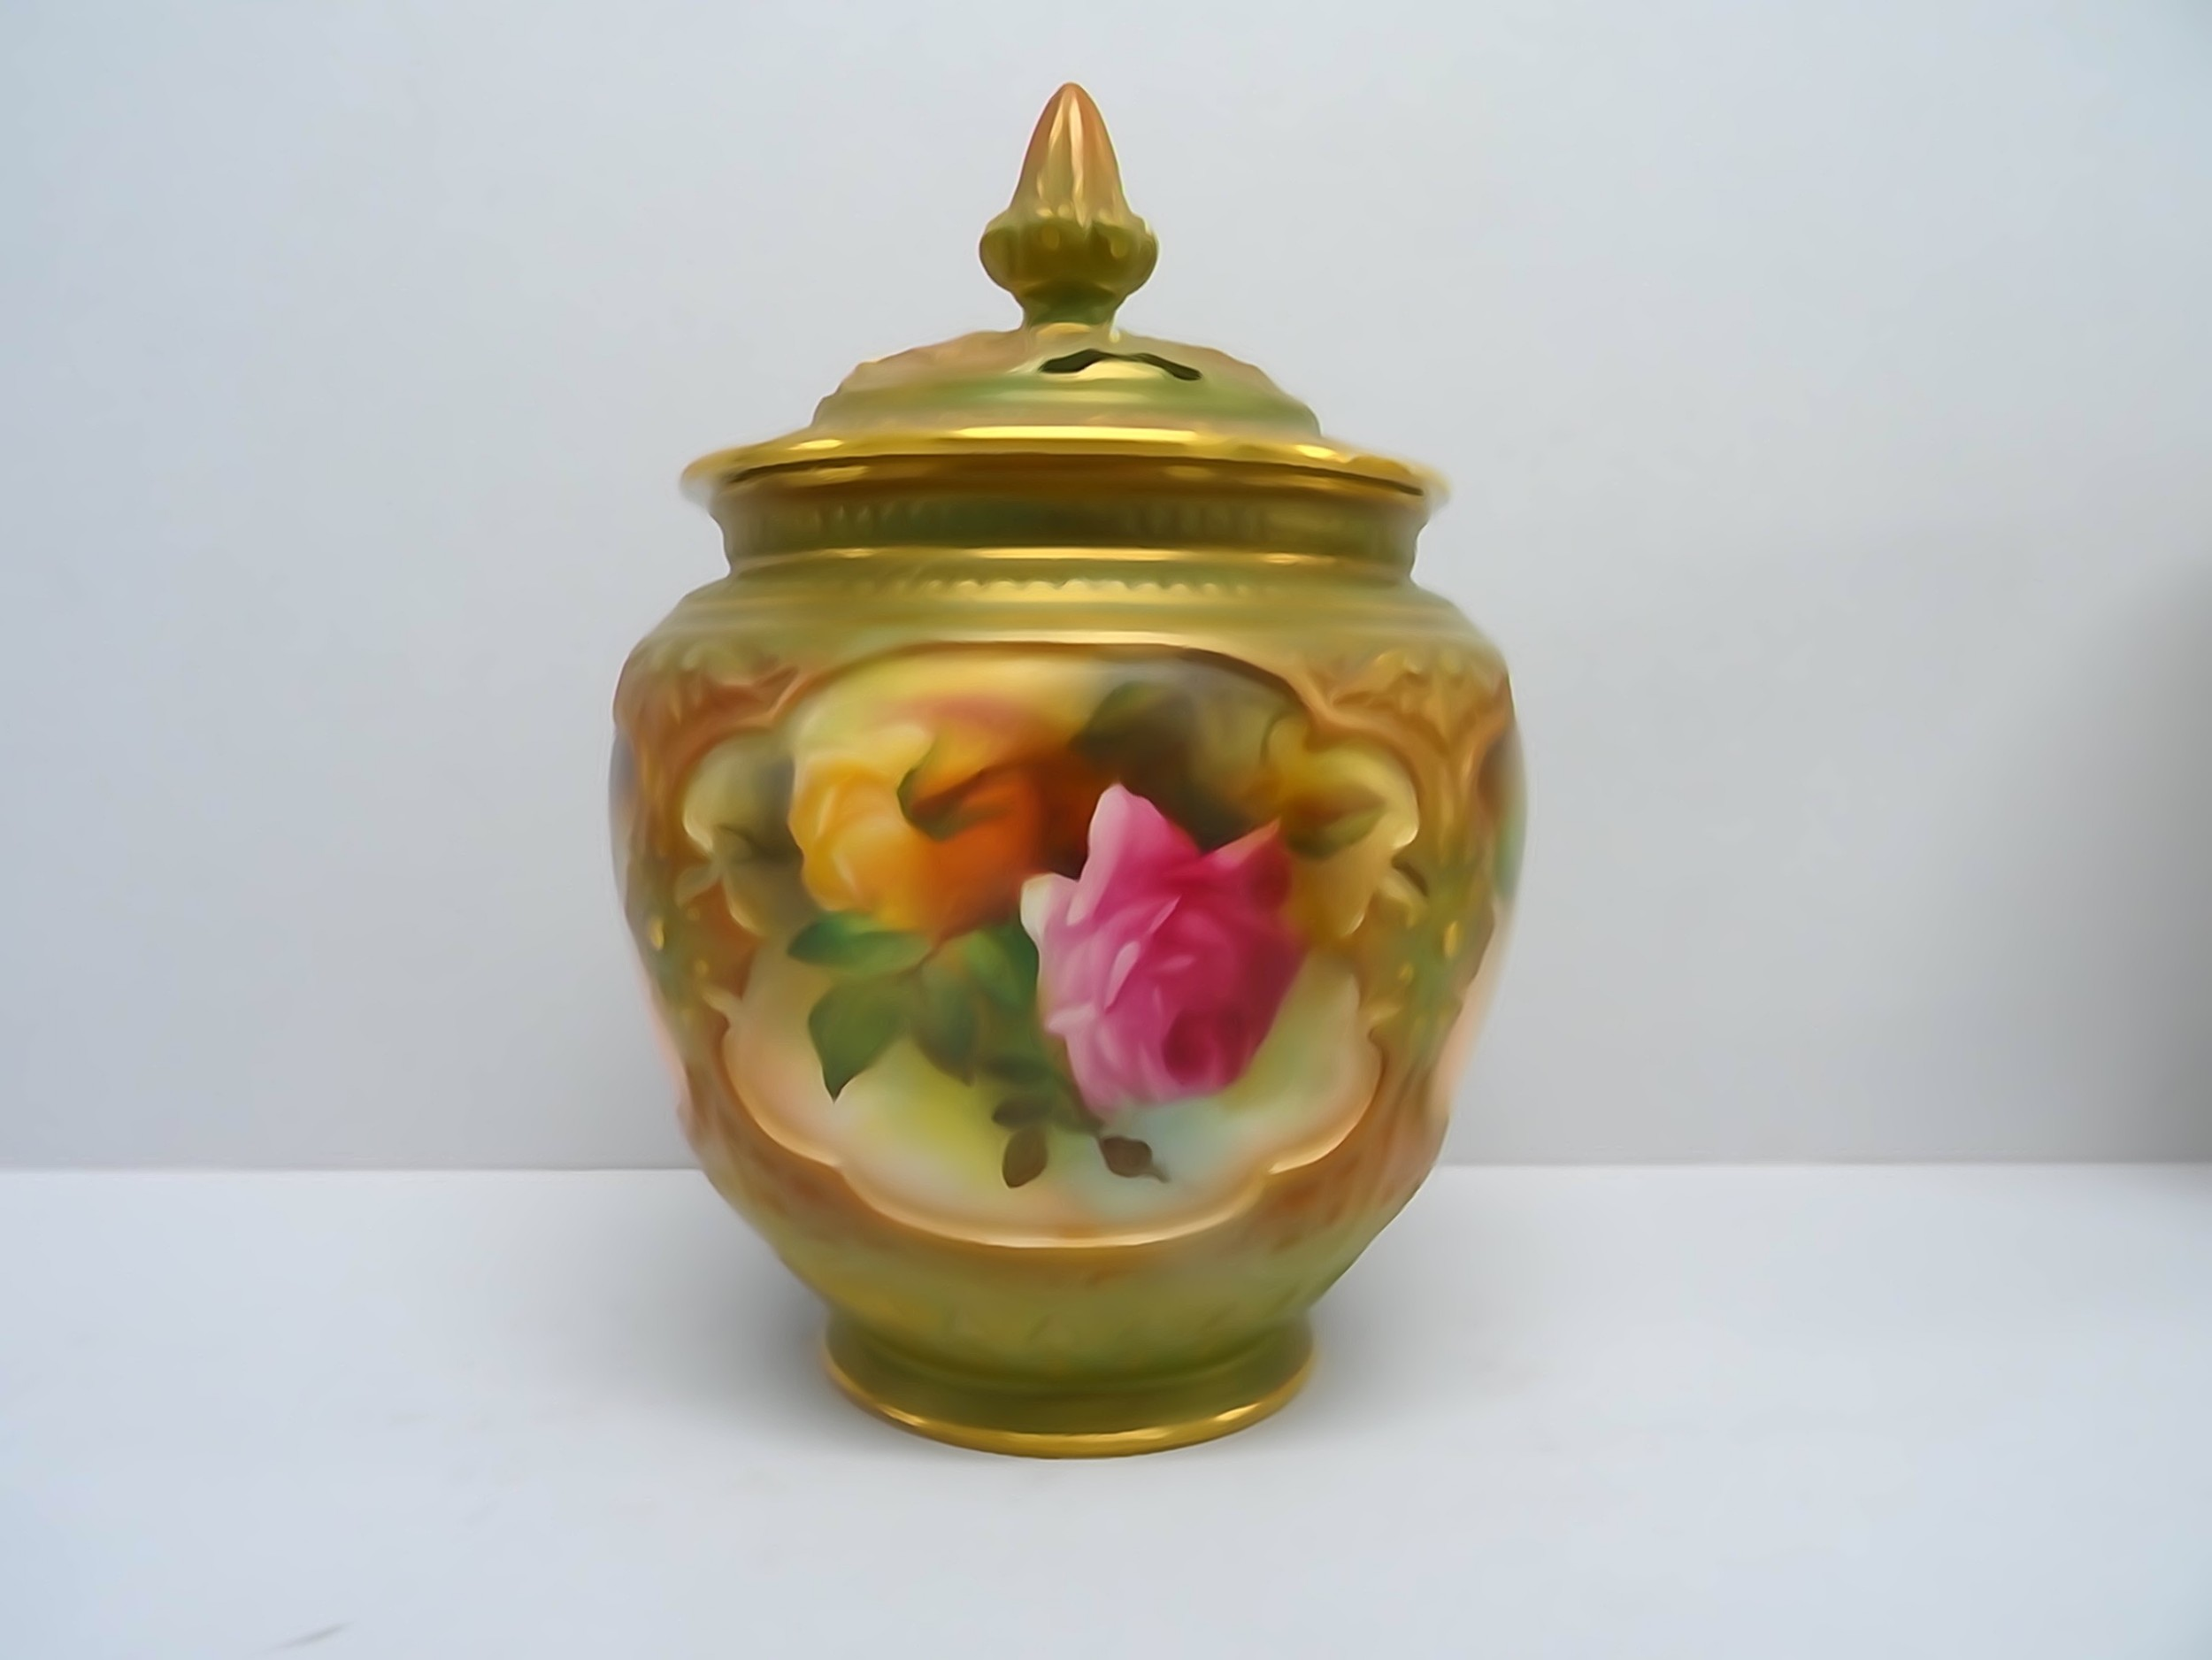 royal worcester rose pot pourri